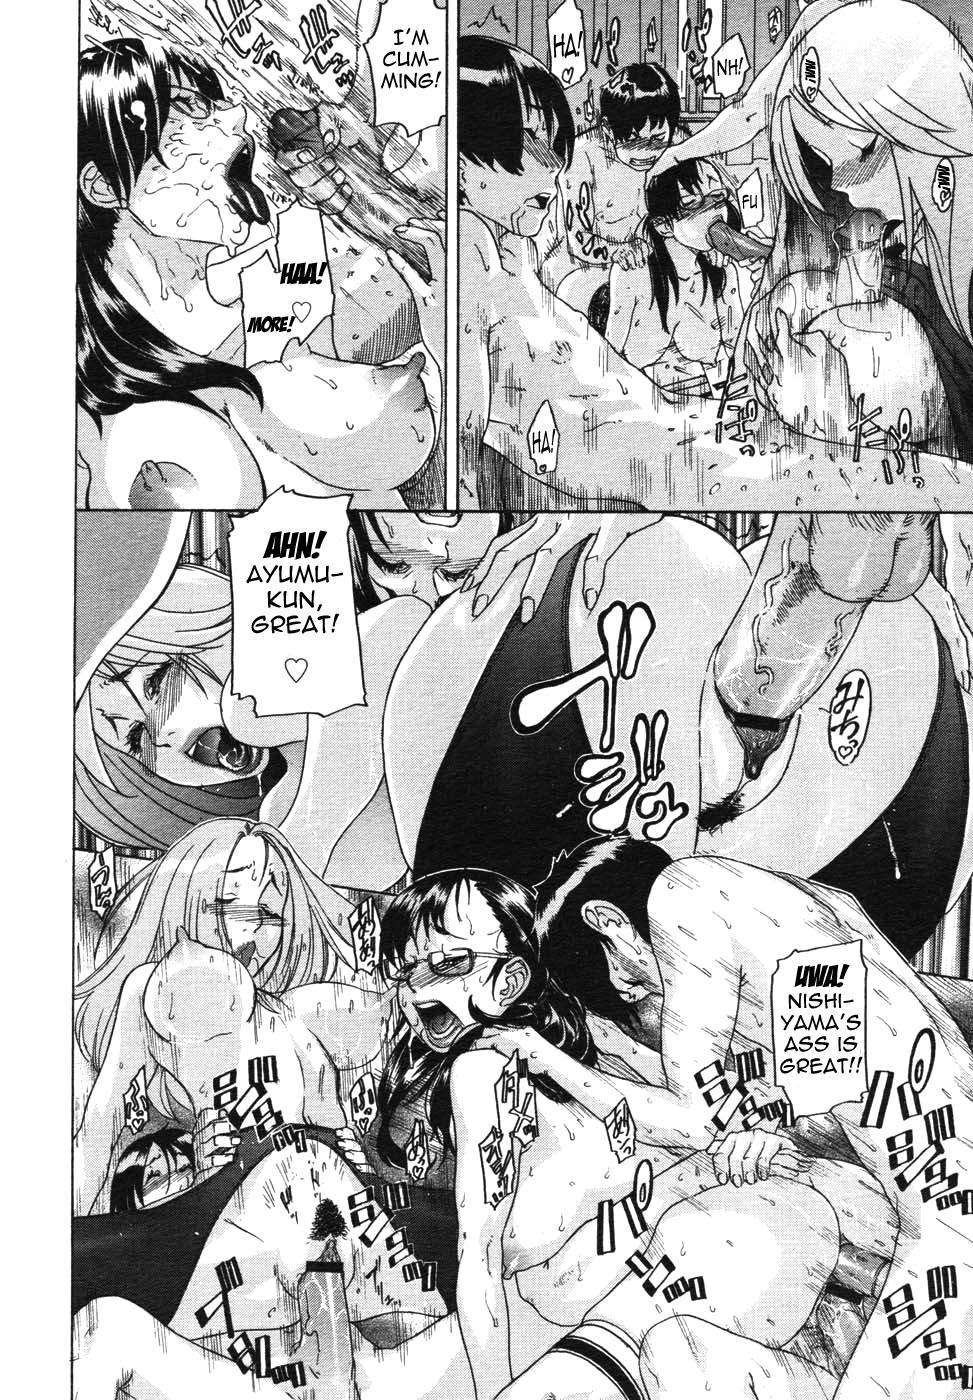 [Royal Koyanagi] Milky Shot! (School Is Crazy these Days) Ch.1-2 [English] 49